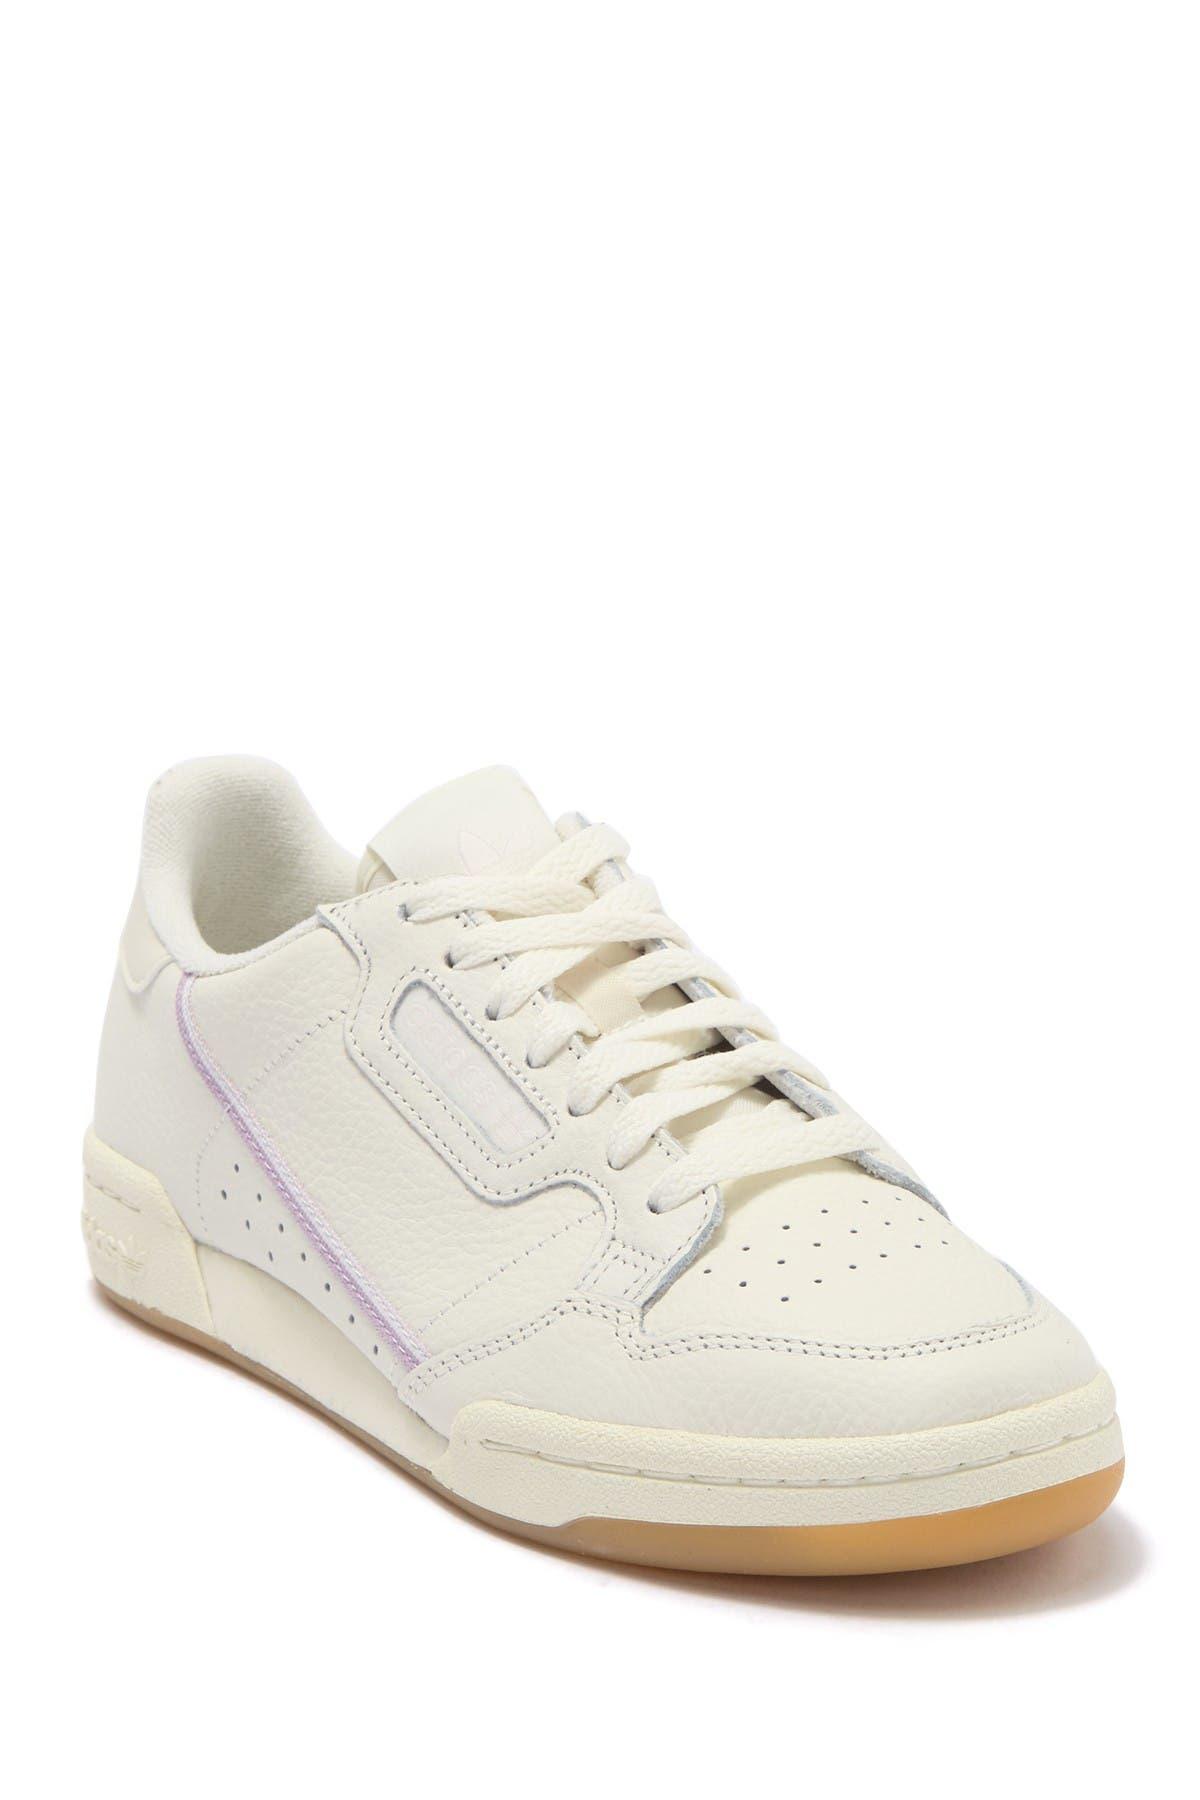 adidas | Continental 80 Sneaker